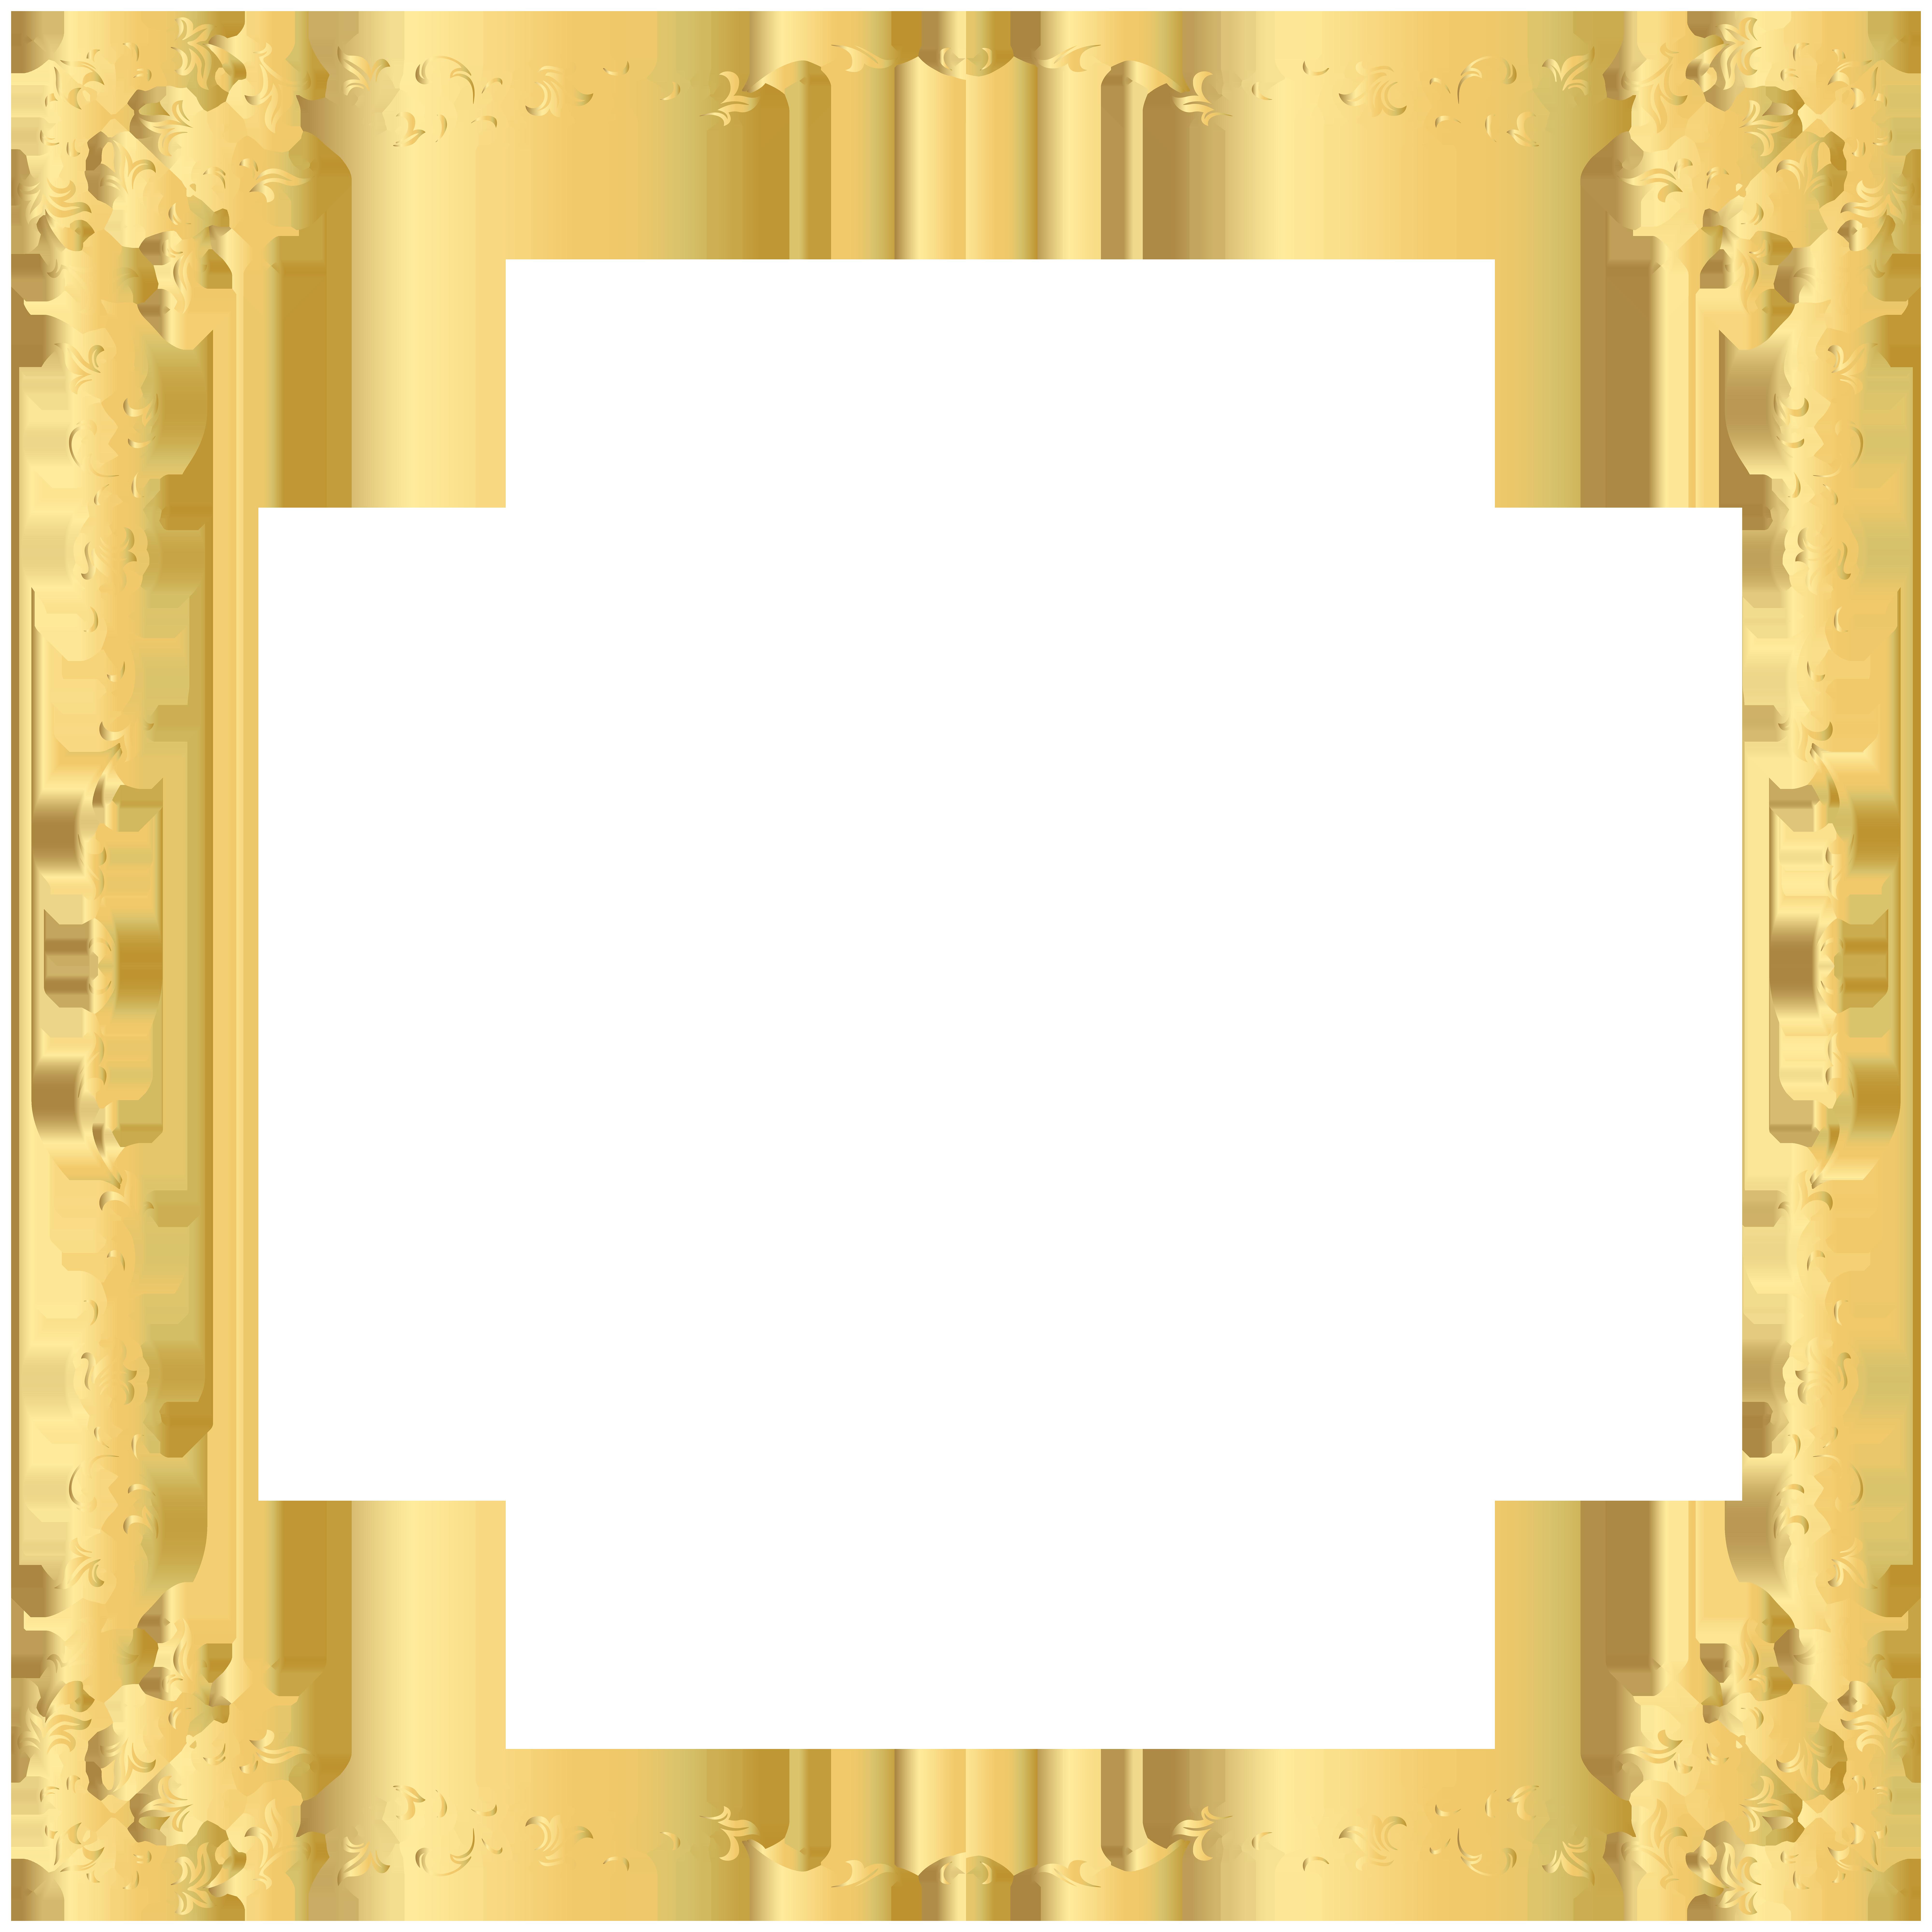 Clipart borders transparent. Decorative border png image